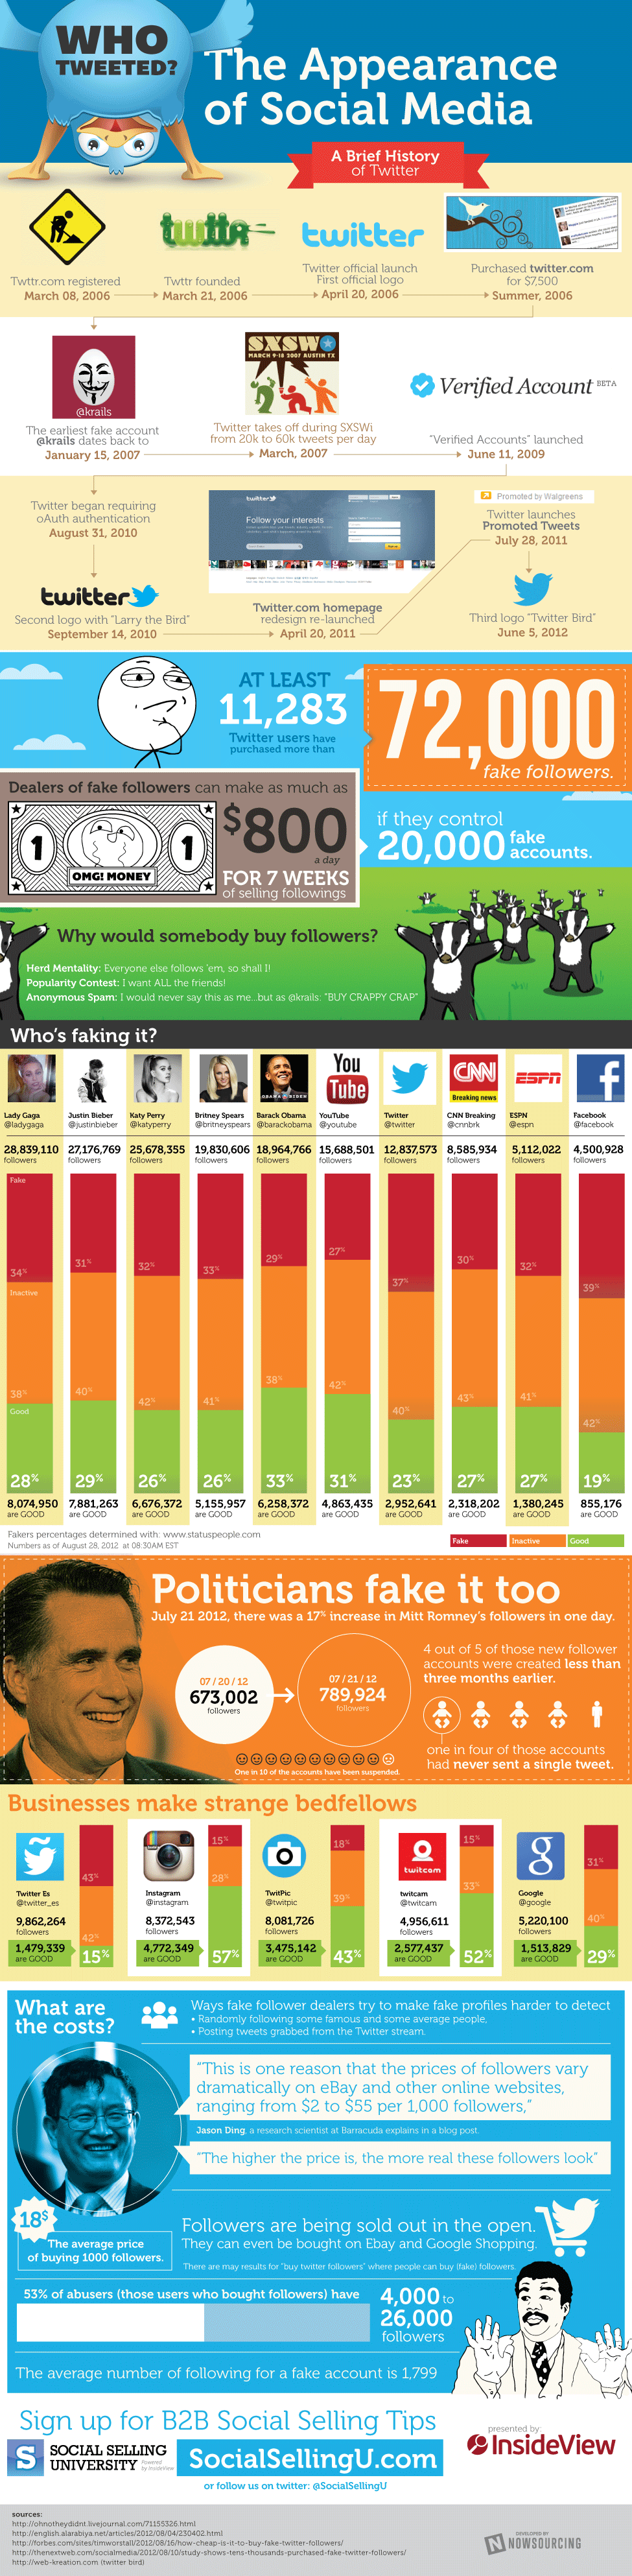 Twitter Followers – Who's Faking It?